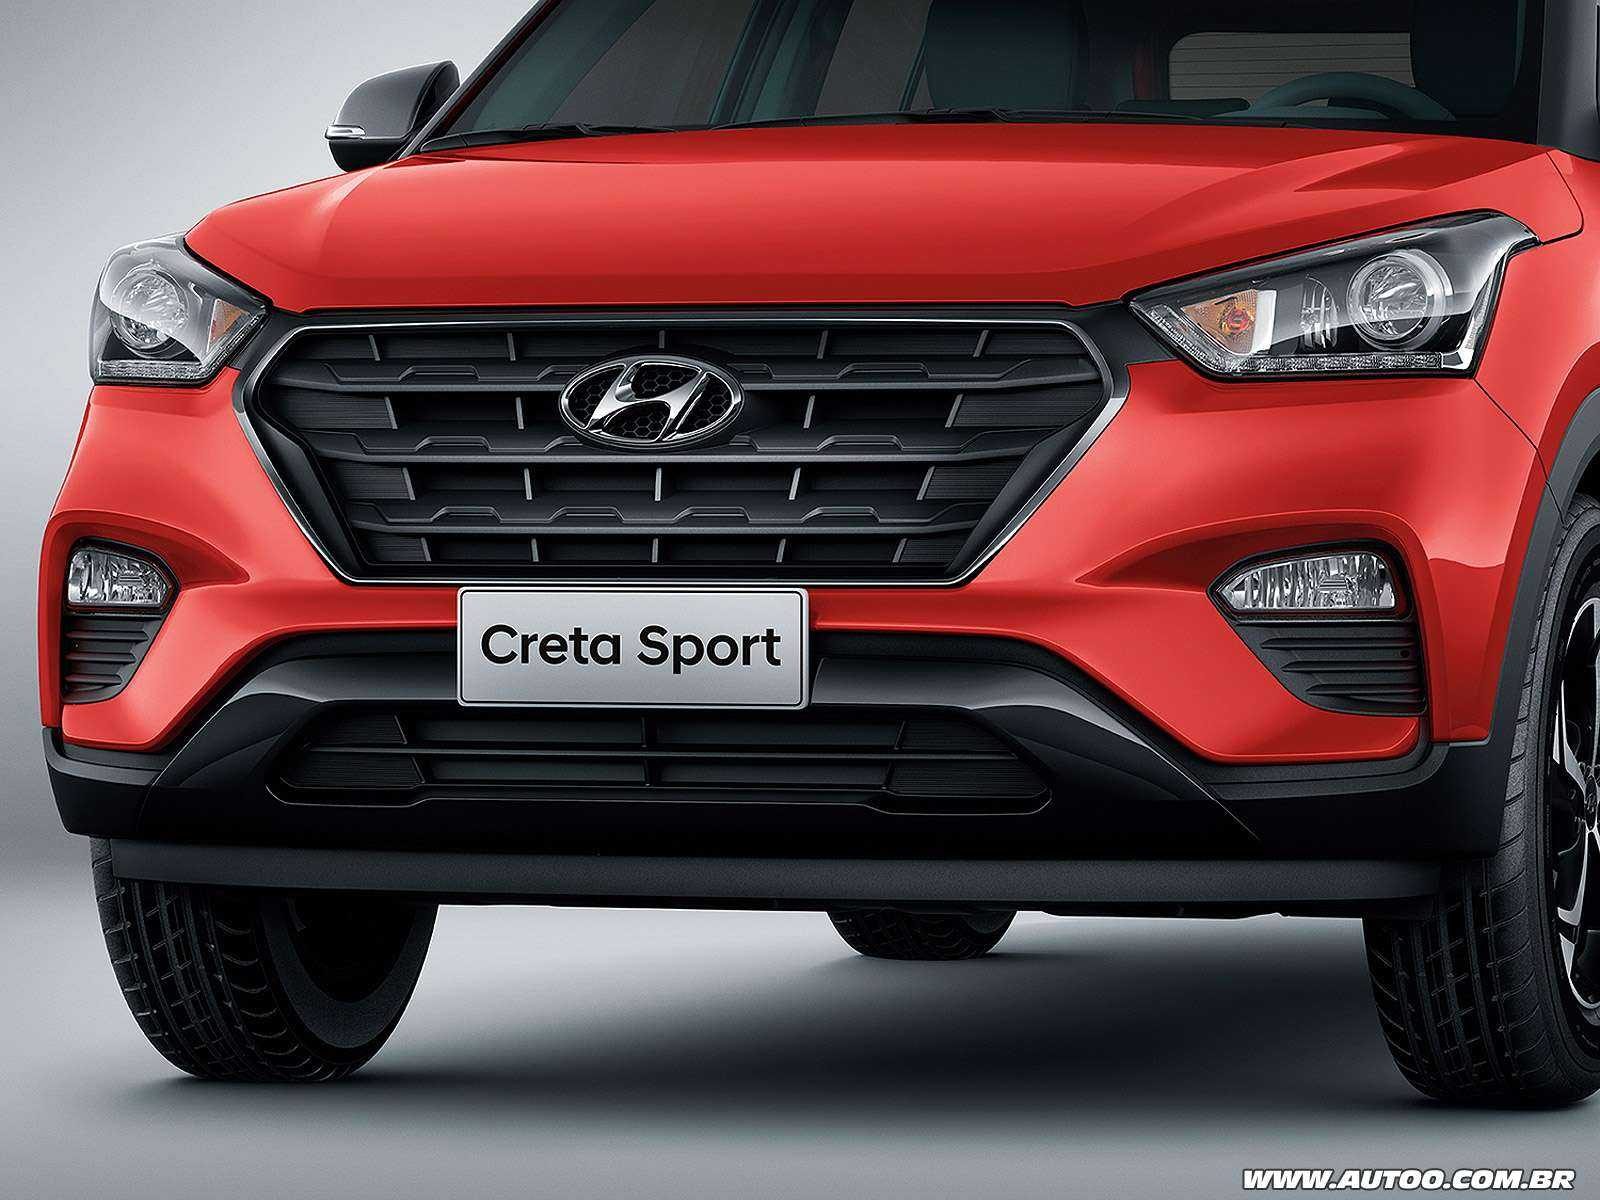 HyundaiCreta 2019 - grade frontal